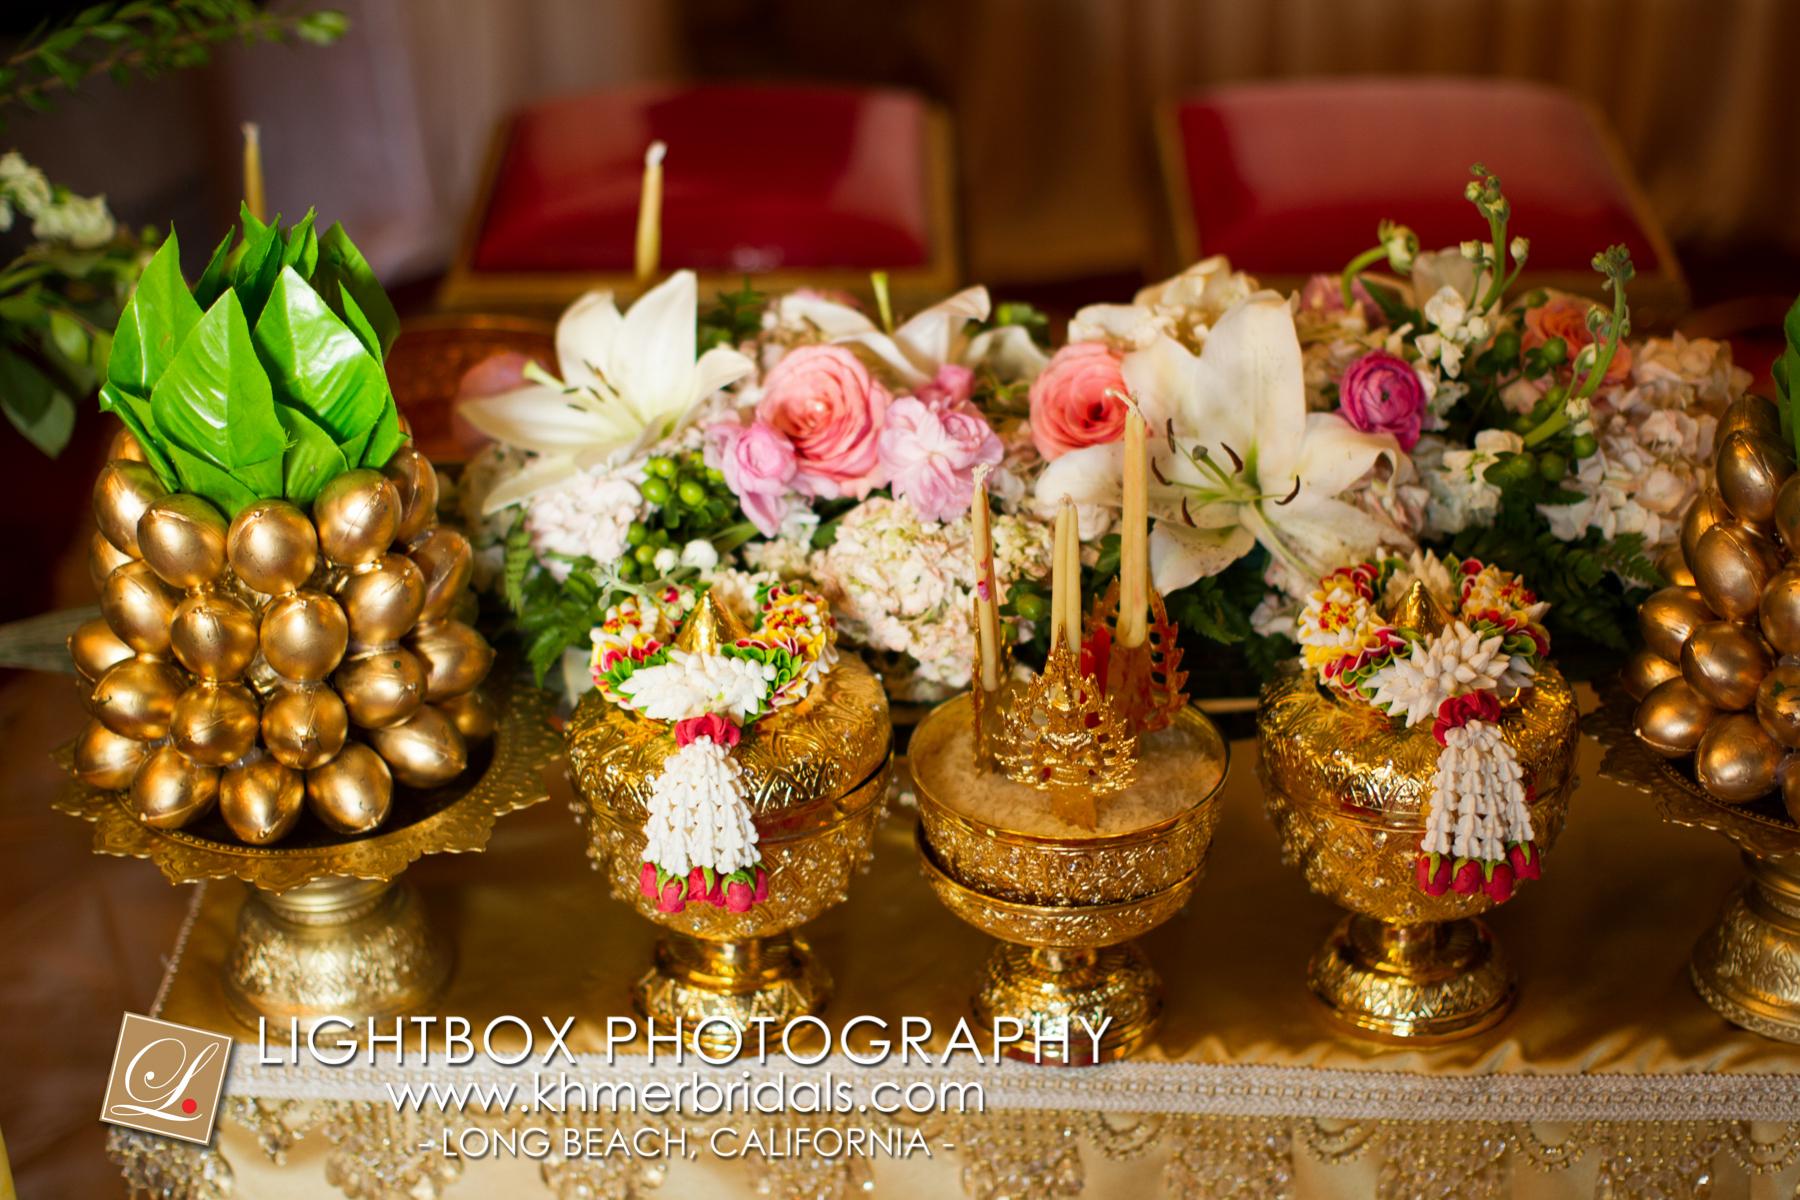 Khmer Bridal Wedding Photography video Apsara Studio Oufit-304.jpg